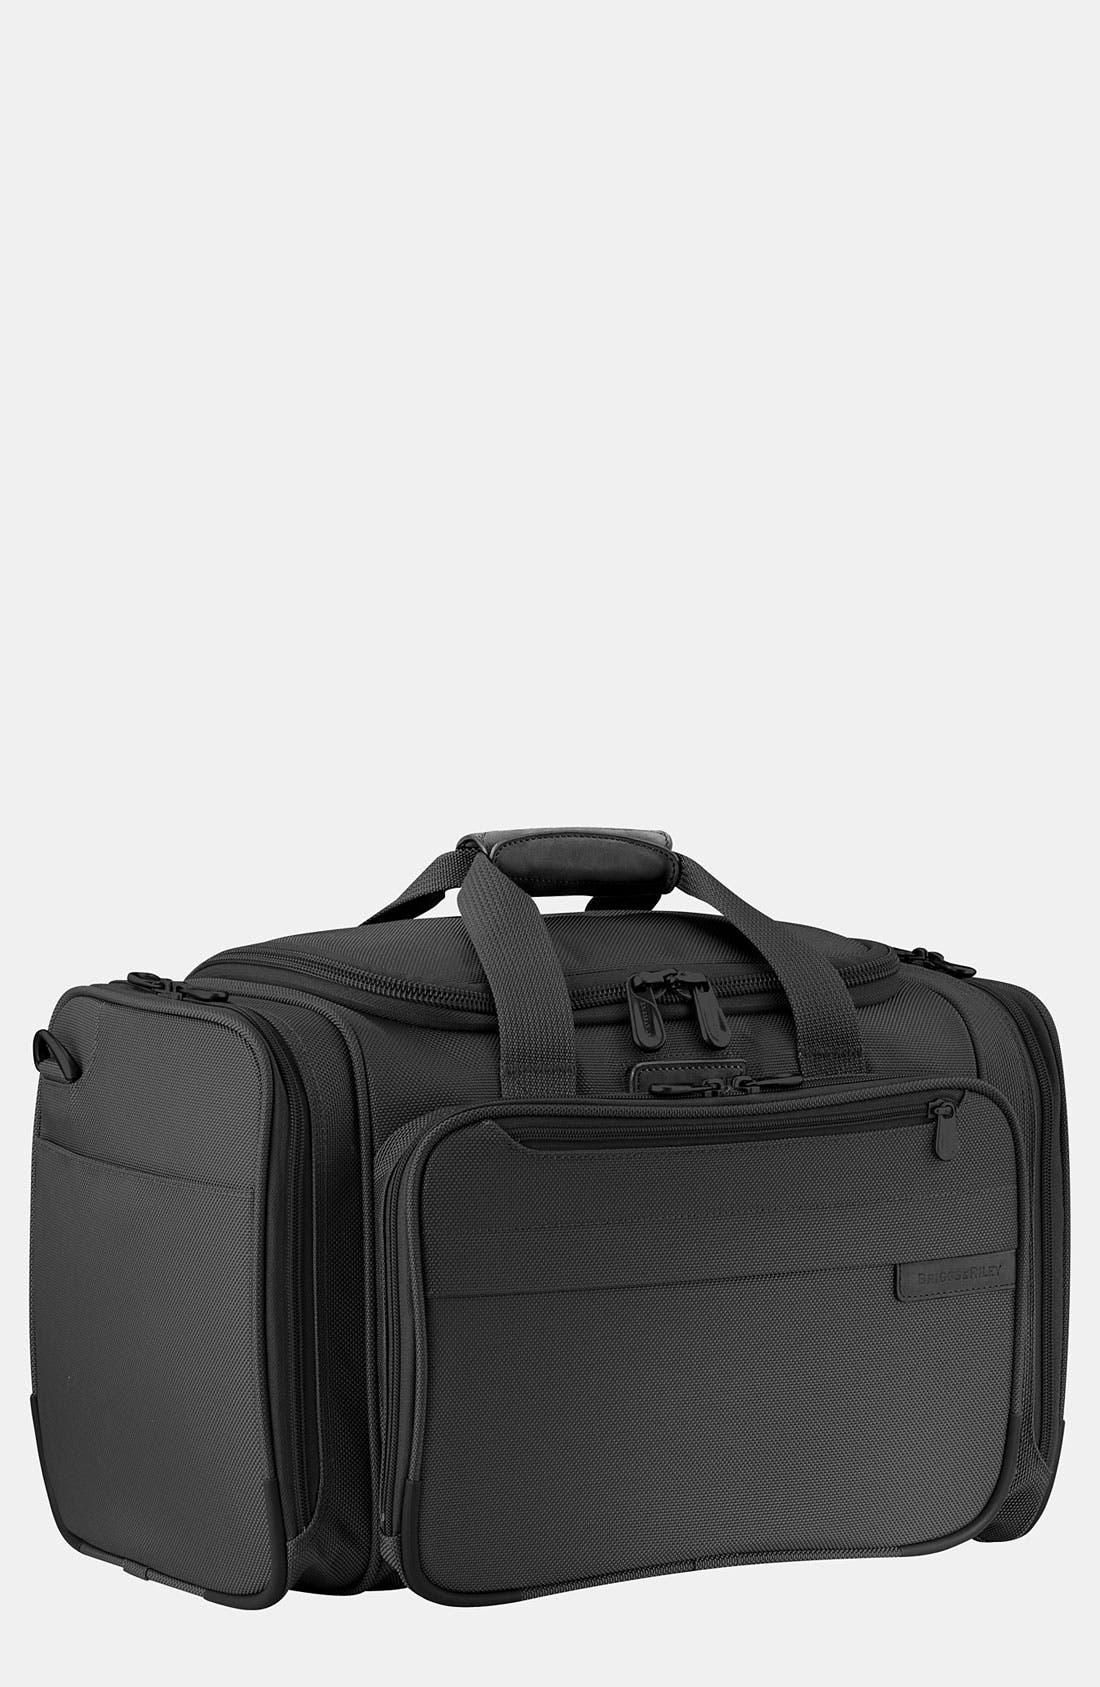 Alternate Image 1 Selected - Briggs & Riley 'Baseline - Deluxe' Duffel Bag